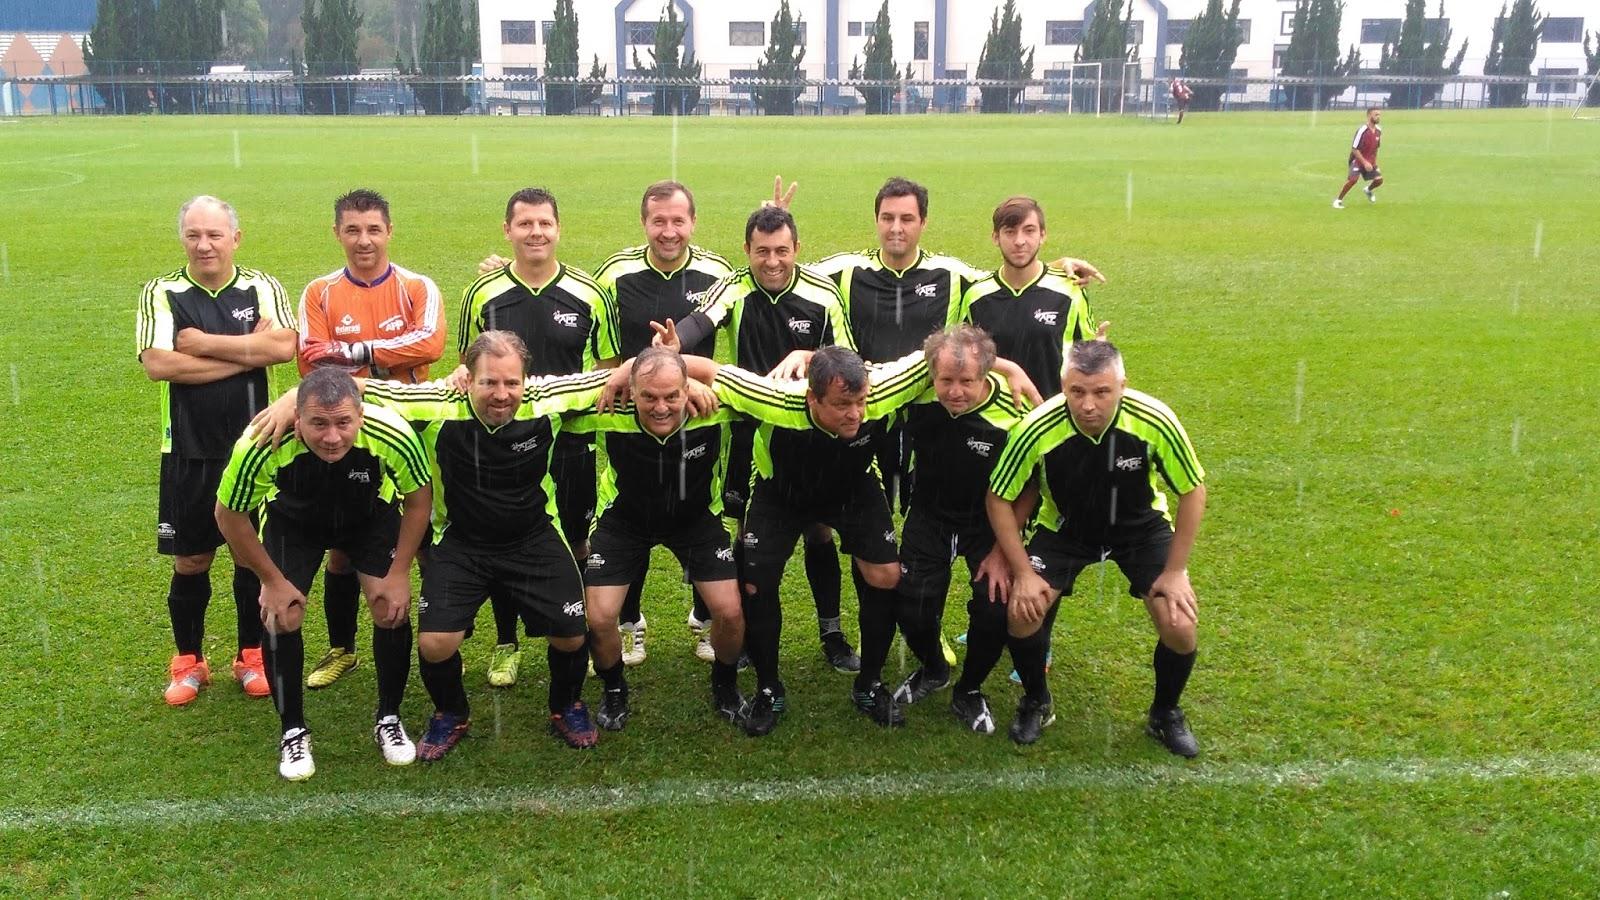 db5045e245 Futebol Medianeira - FL1